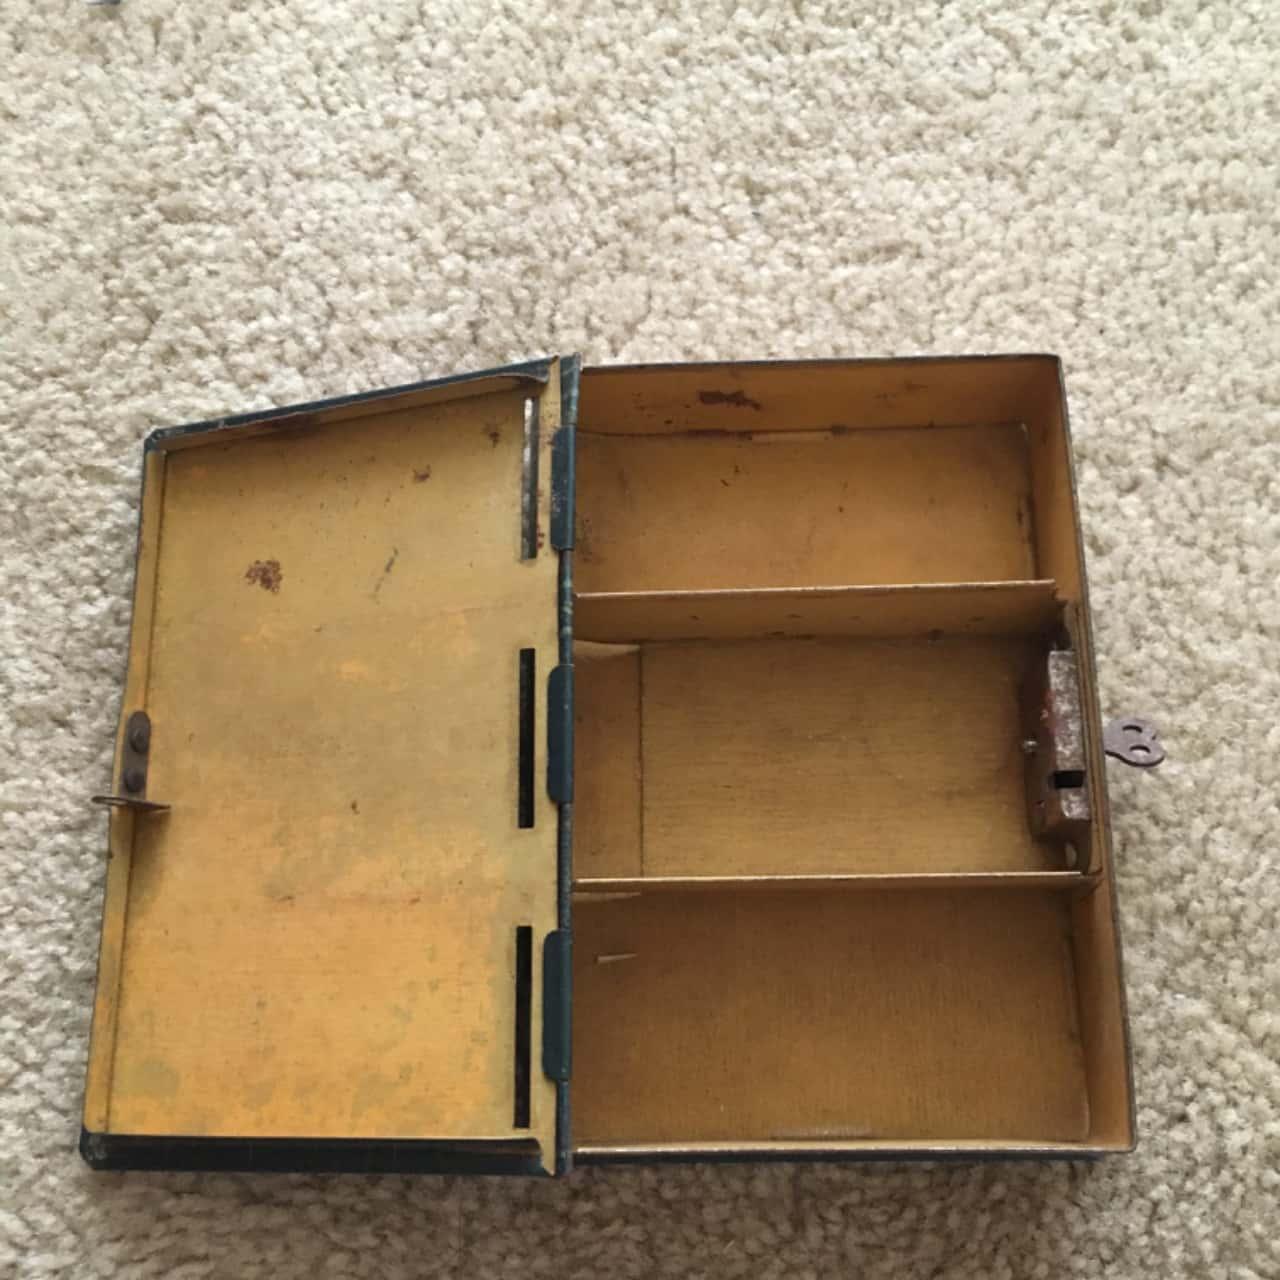 Vintage Happy Days Book Shaped Money Tin Box with Key